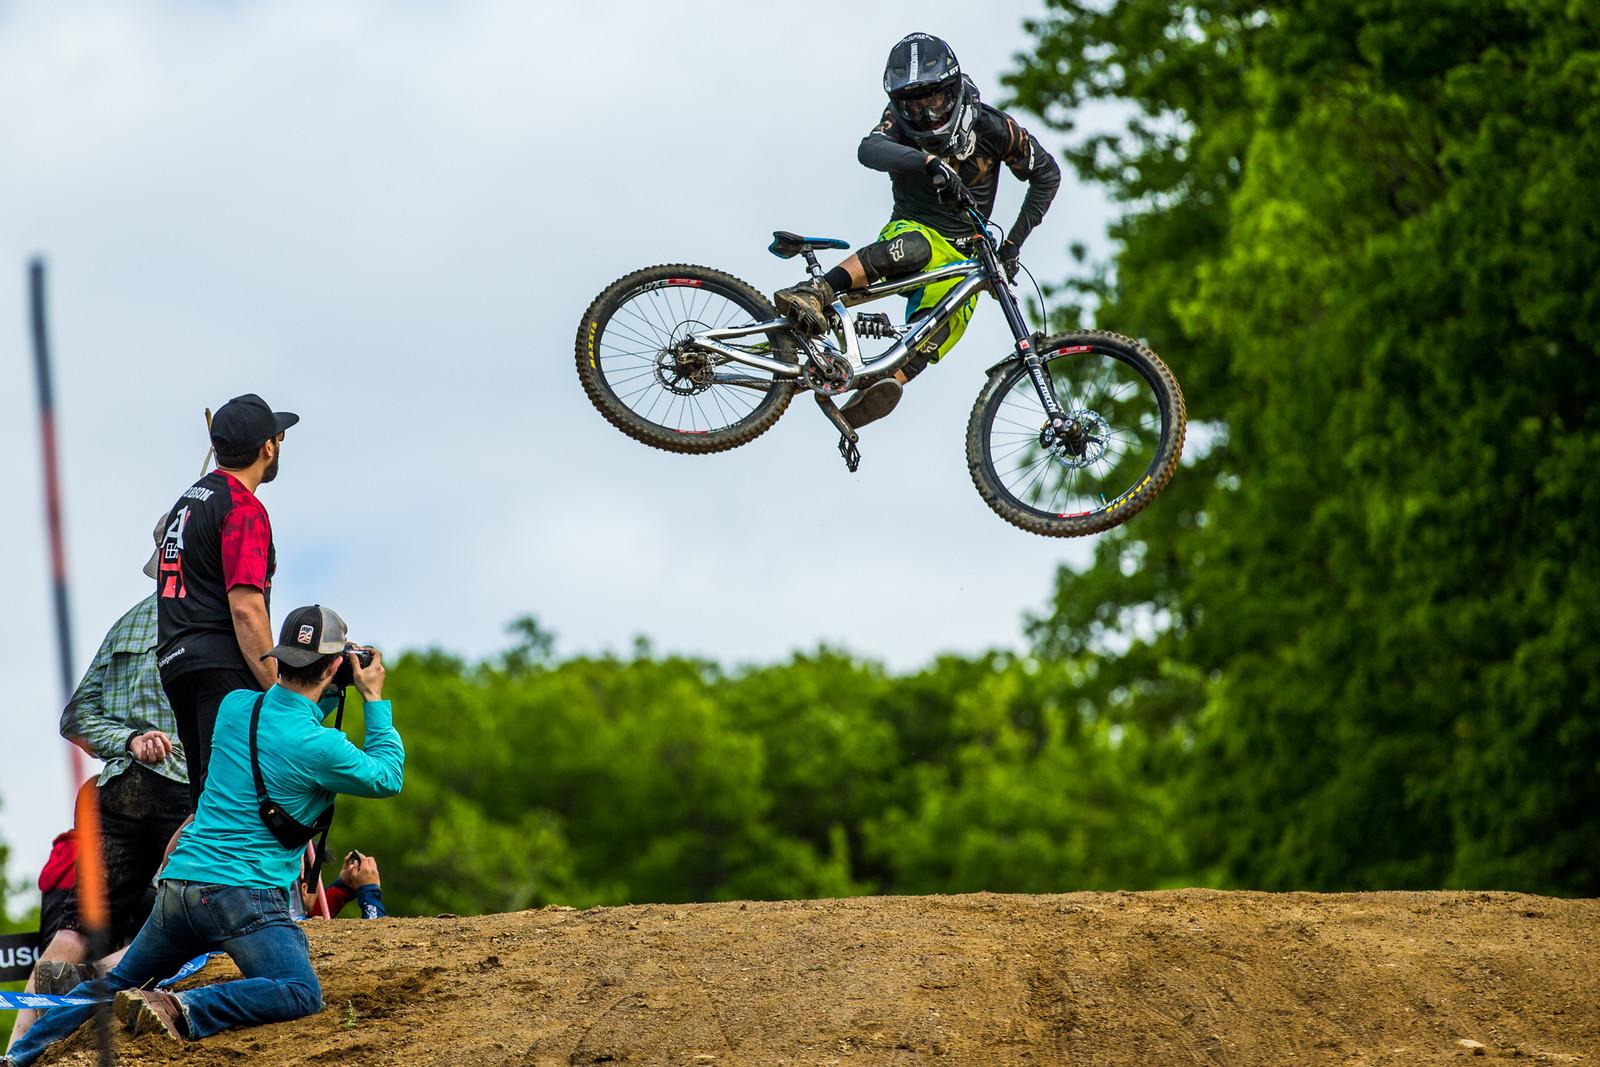 U.S. Open Whip-Off Gallery! Tyler McCaul - US Open Whip Off! - Mountain Biking Pictures - Vital MTB